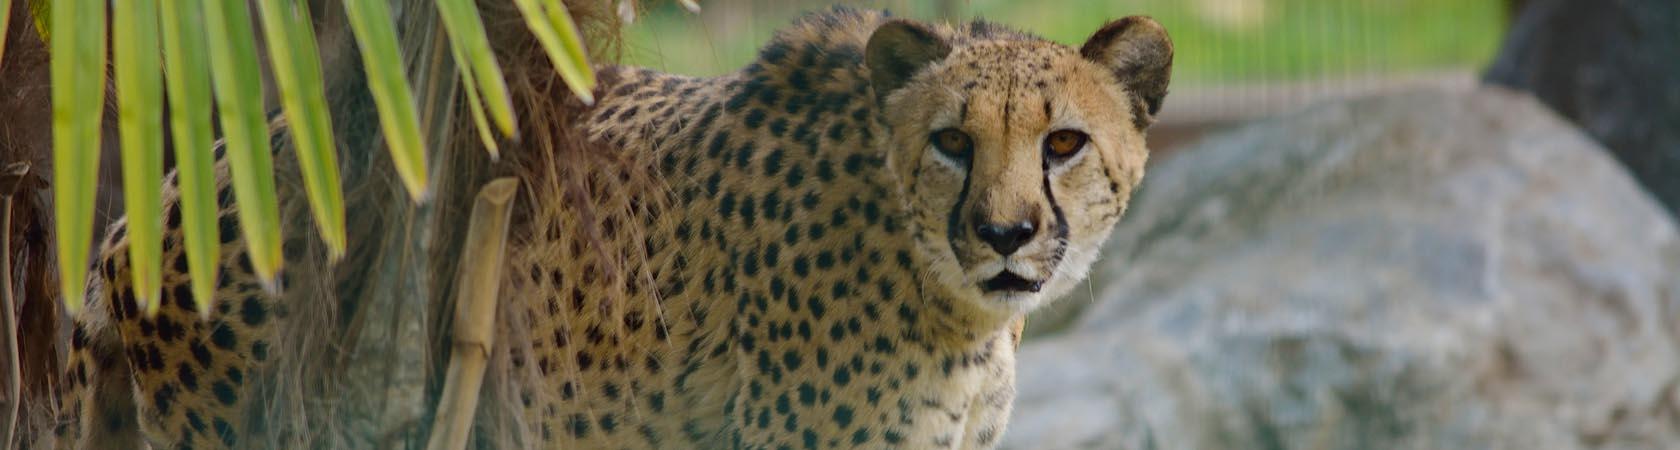 ricerca-ghepardo-parco-faunistico-le-cornelle-leonardodelfin